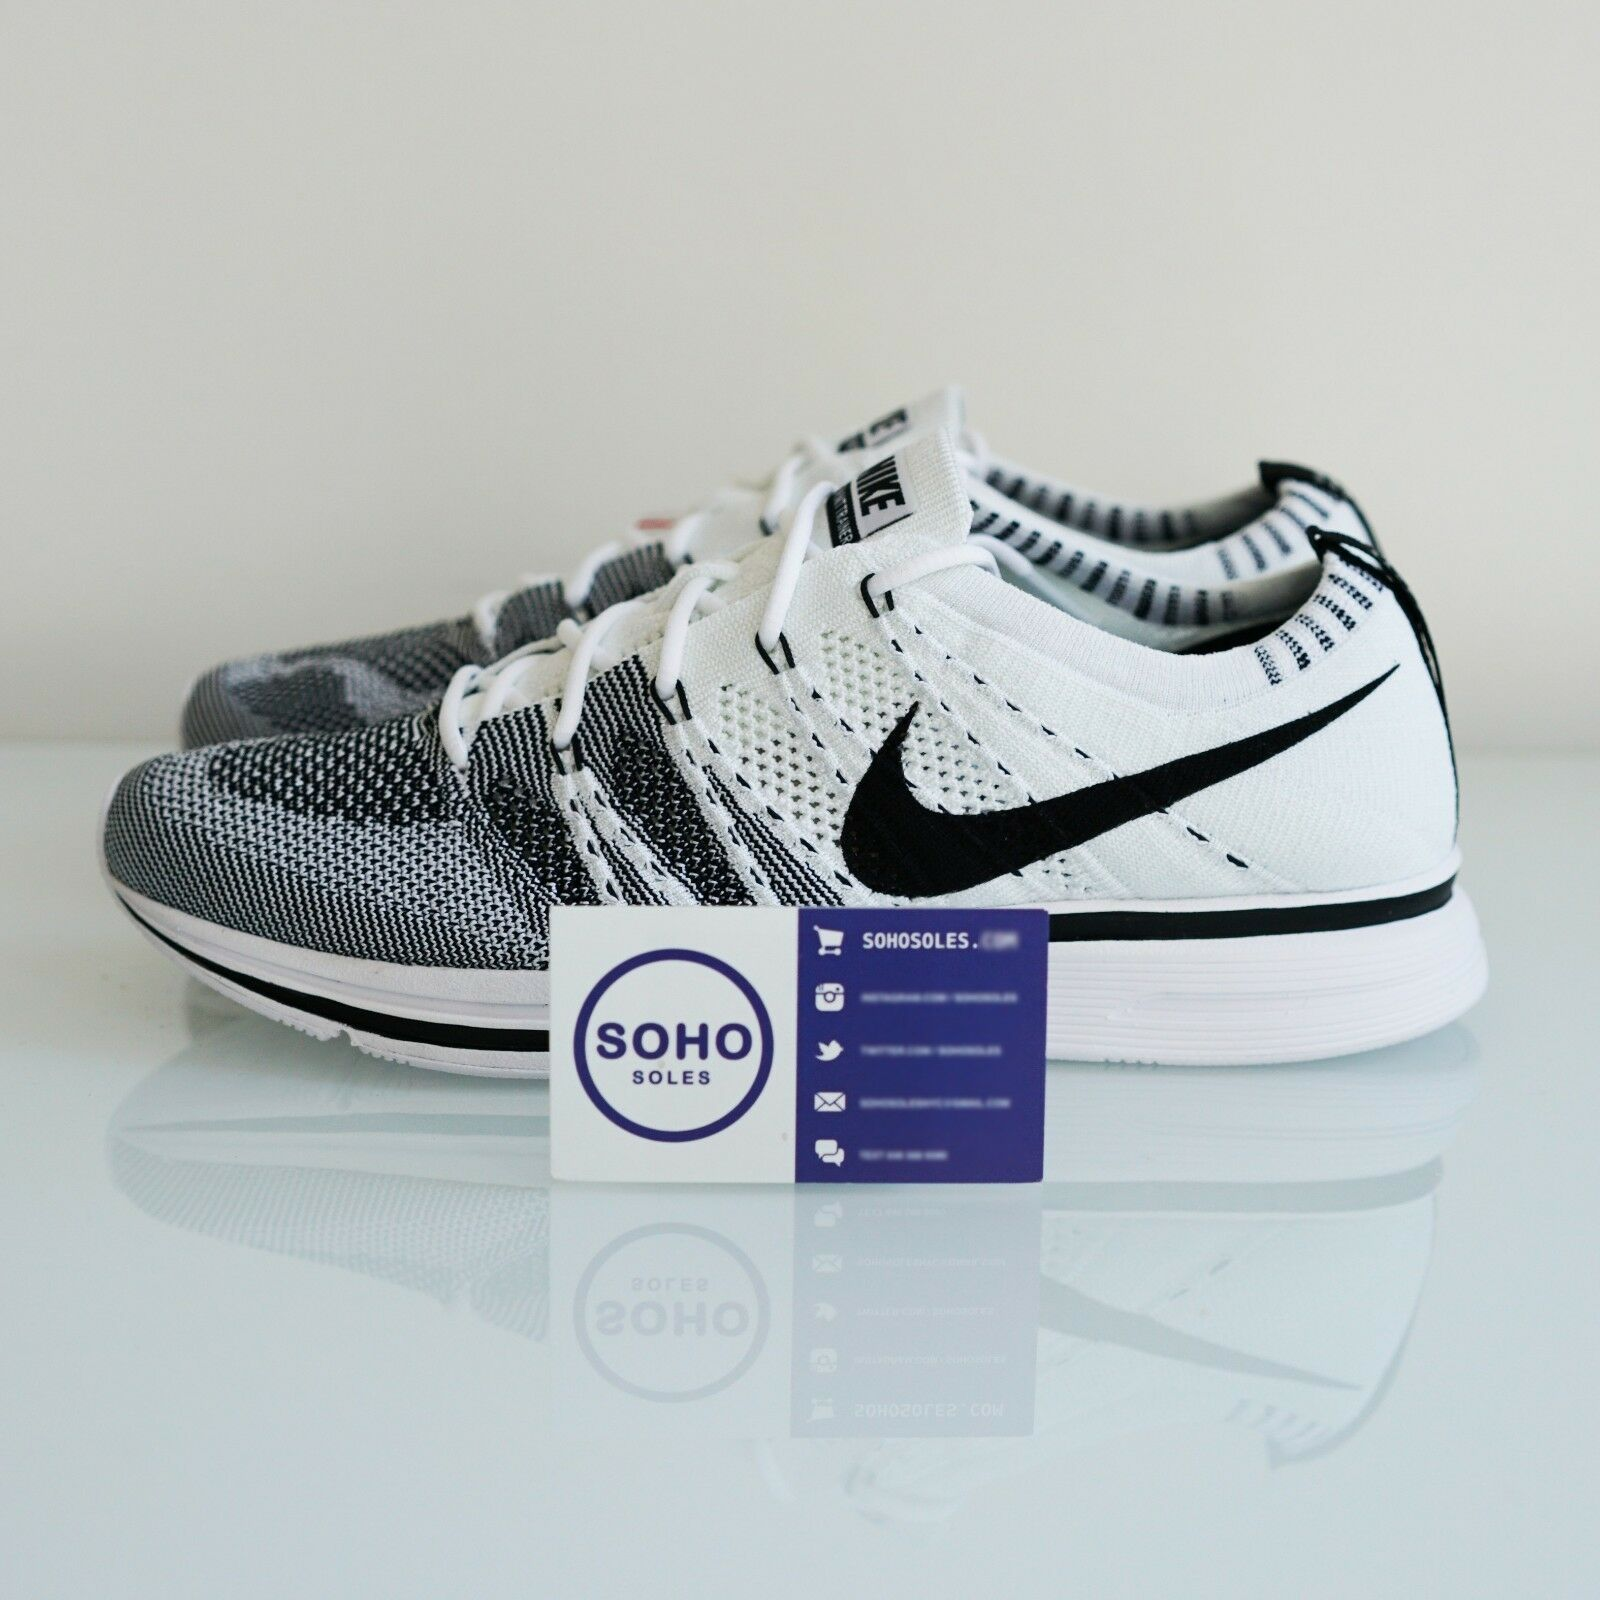 the latest 0be89 9fc2e Nike Nike Nike Flyknit Trainer og blanco negro ah8396 100 tamaño 7.5-15  Cookies Cream